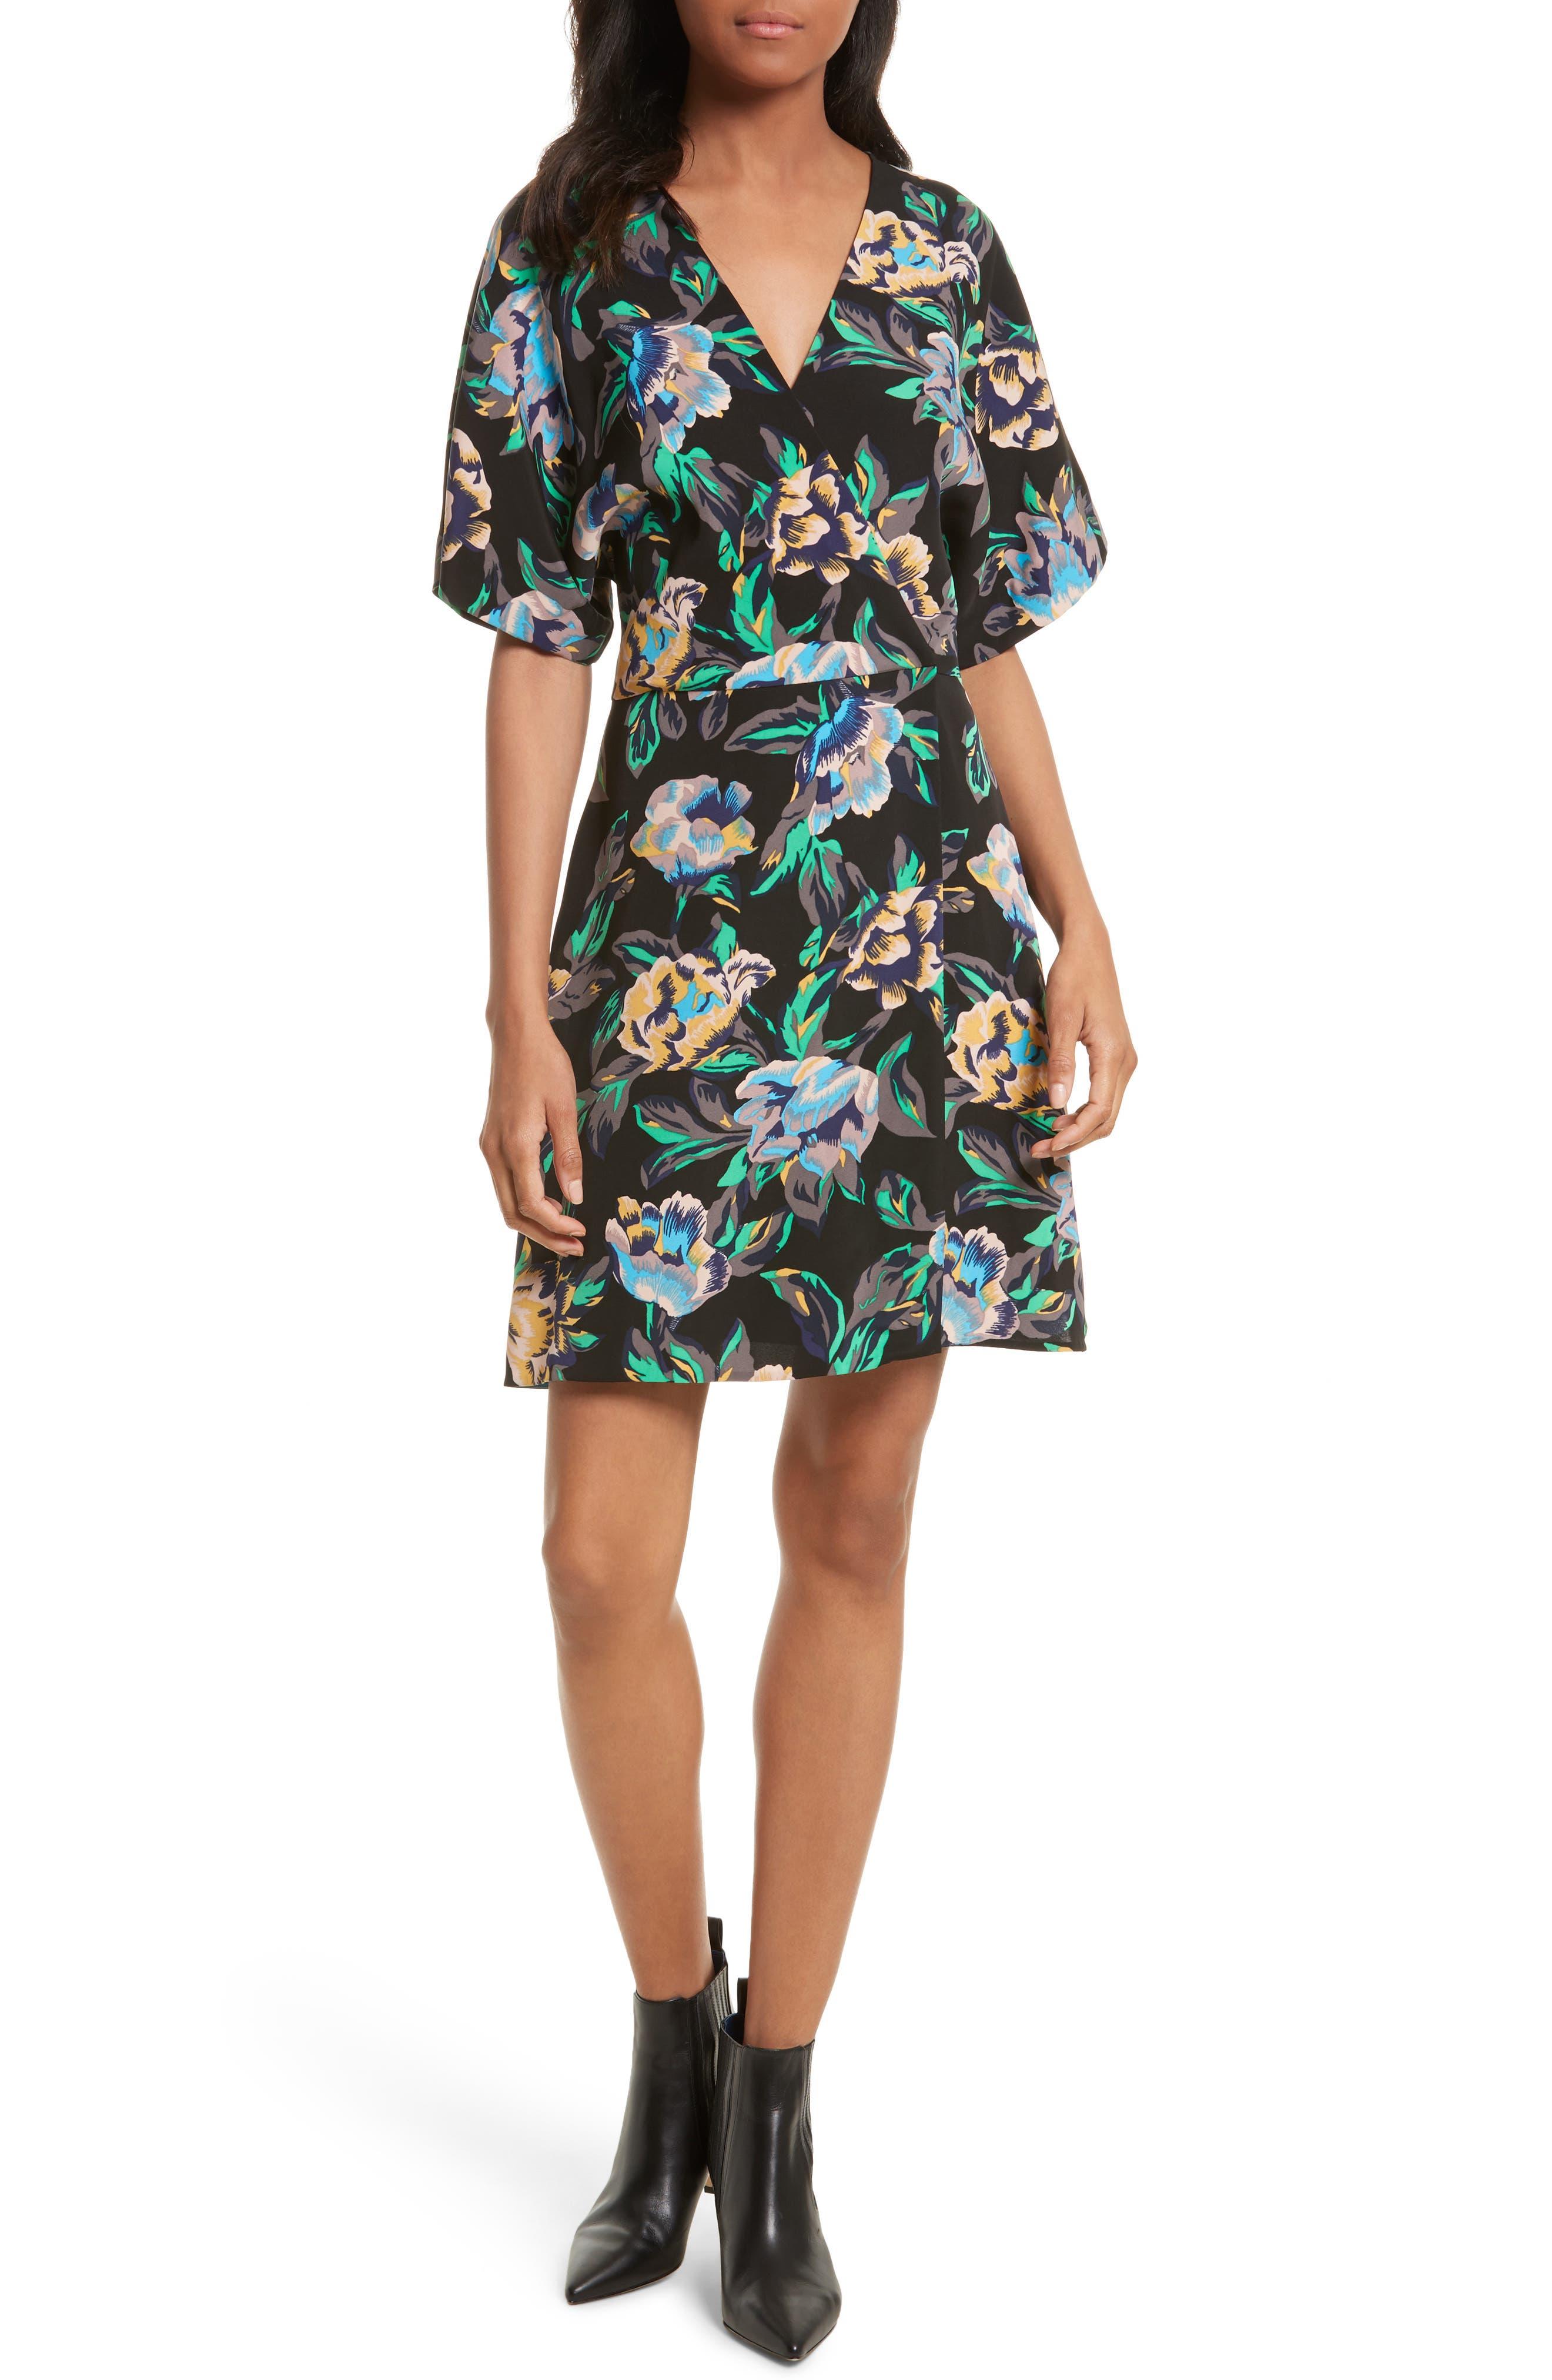 Alternate Image 1 Selected - Diane von Furstenberg Floral Faux Wrap Dress